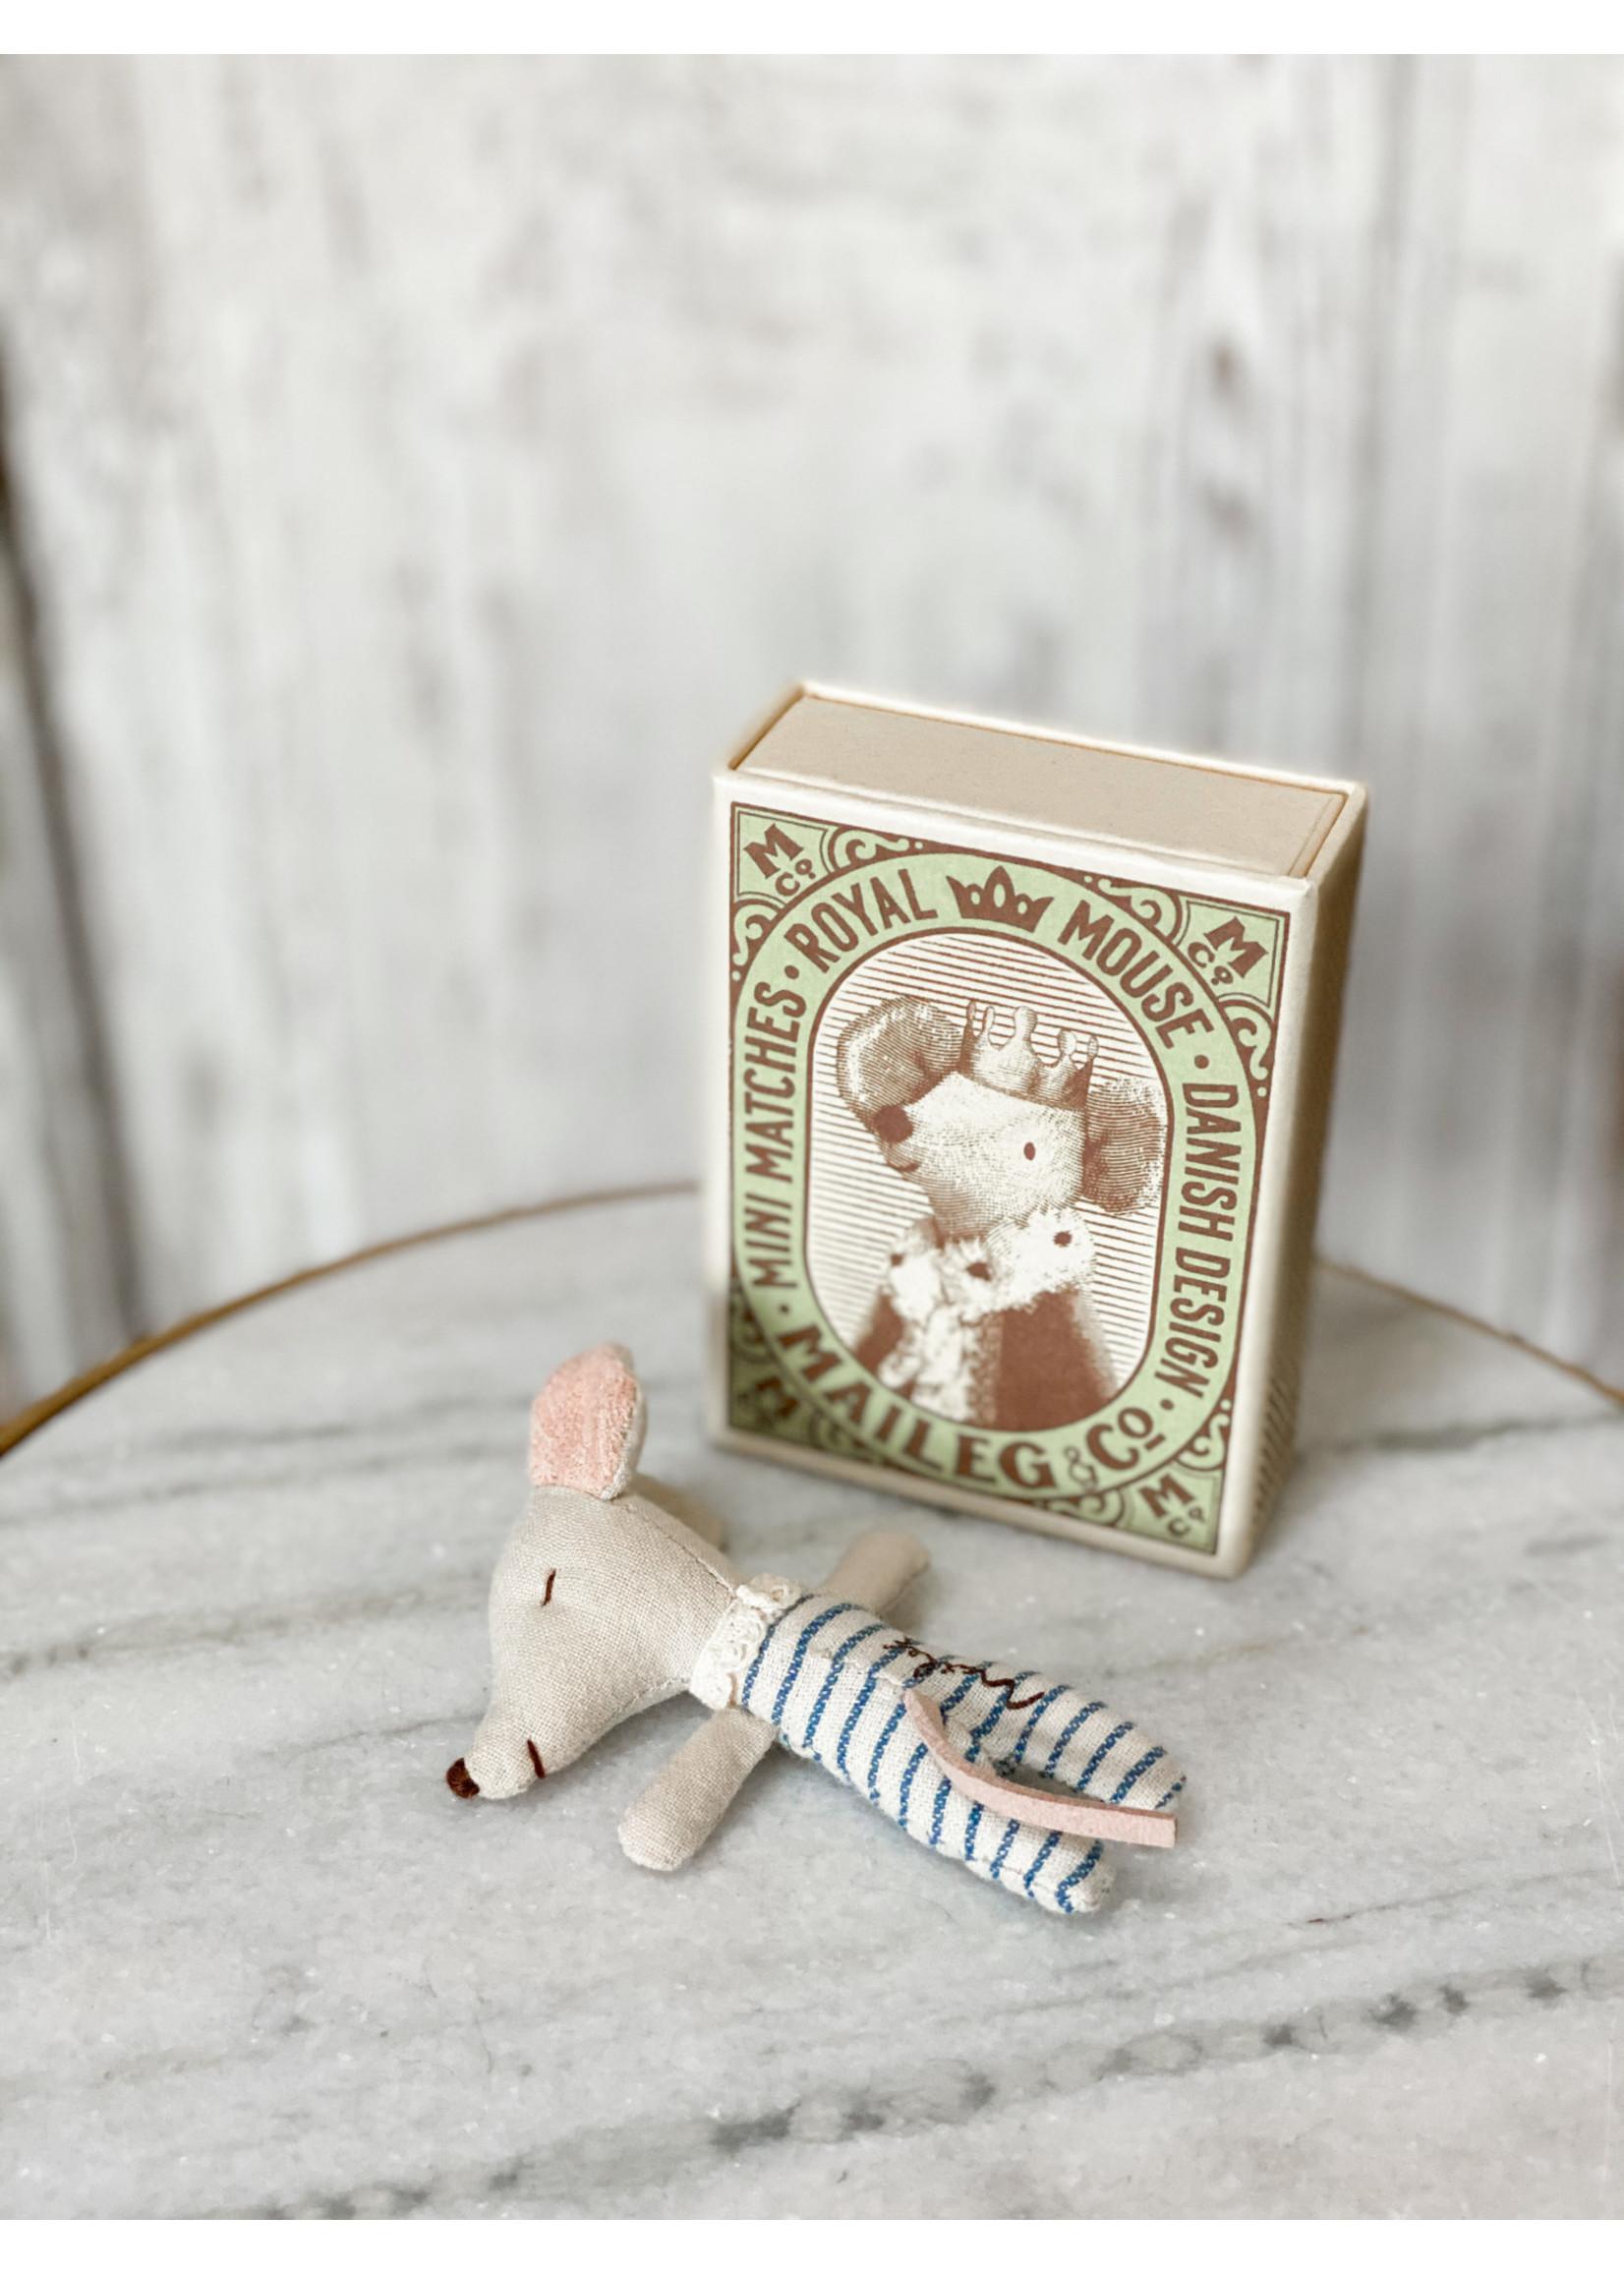 Maileg Baby Boy Mouse - Sleepy Wakey in Matchbox